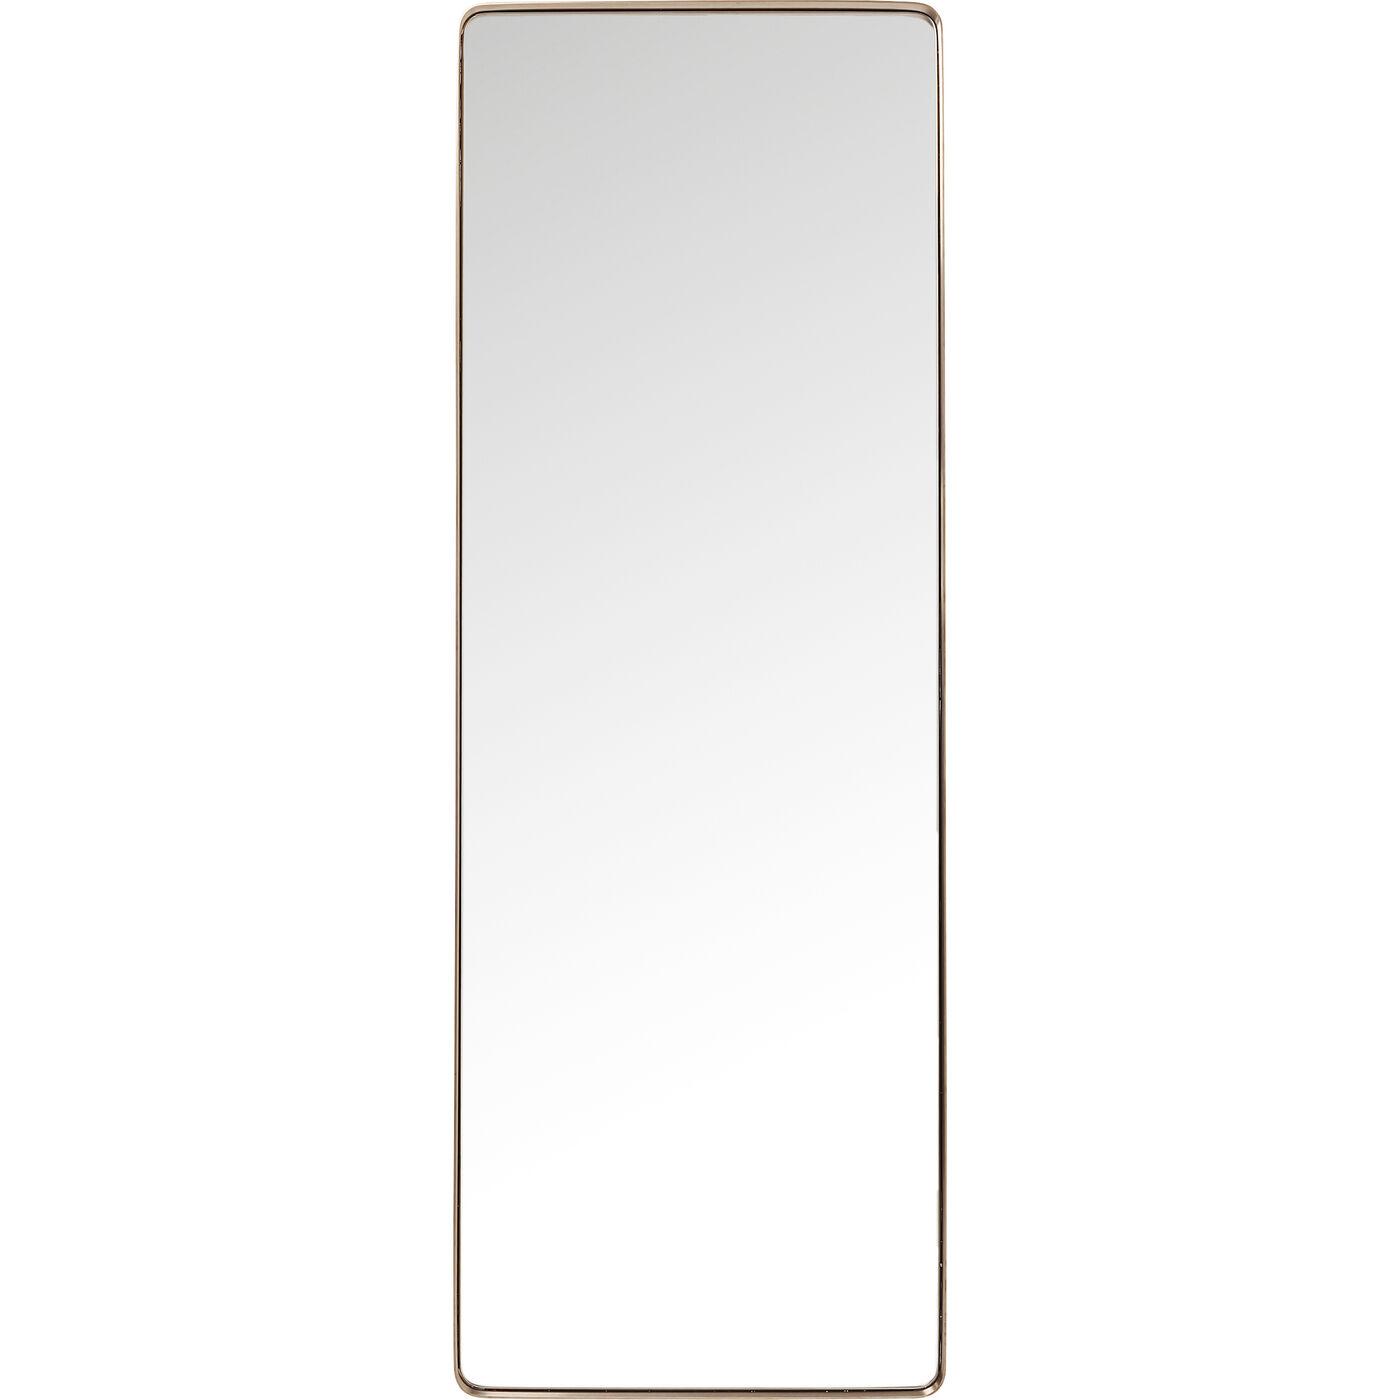 Spiegel Curve MO Rectangular Copper 200x70cm